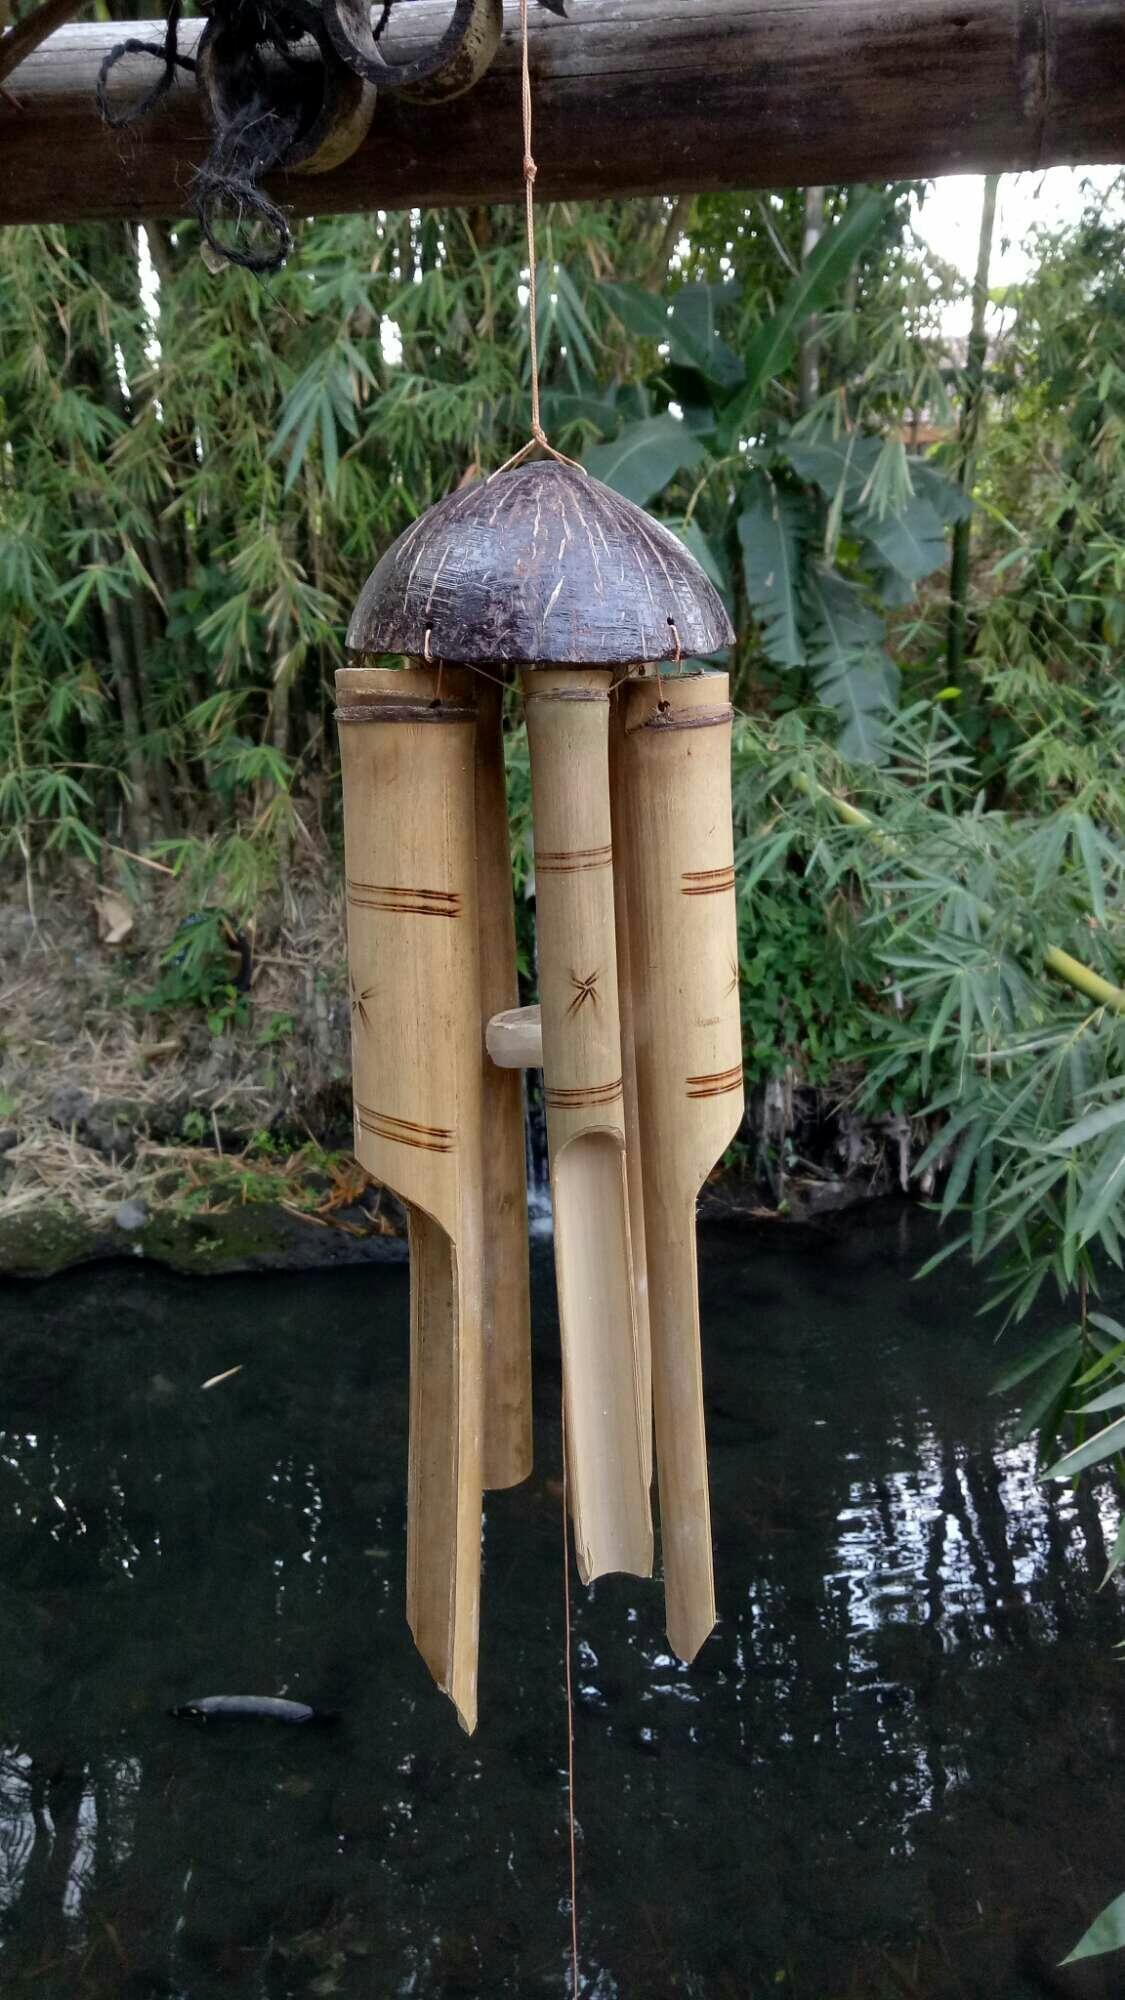 Bamboo wind bell /kentongan angin